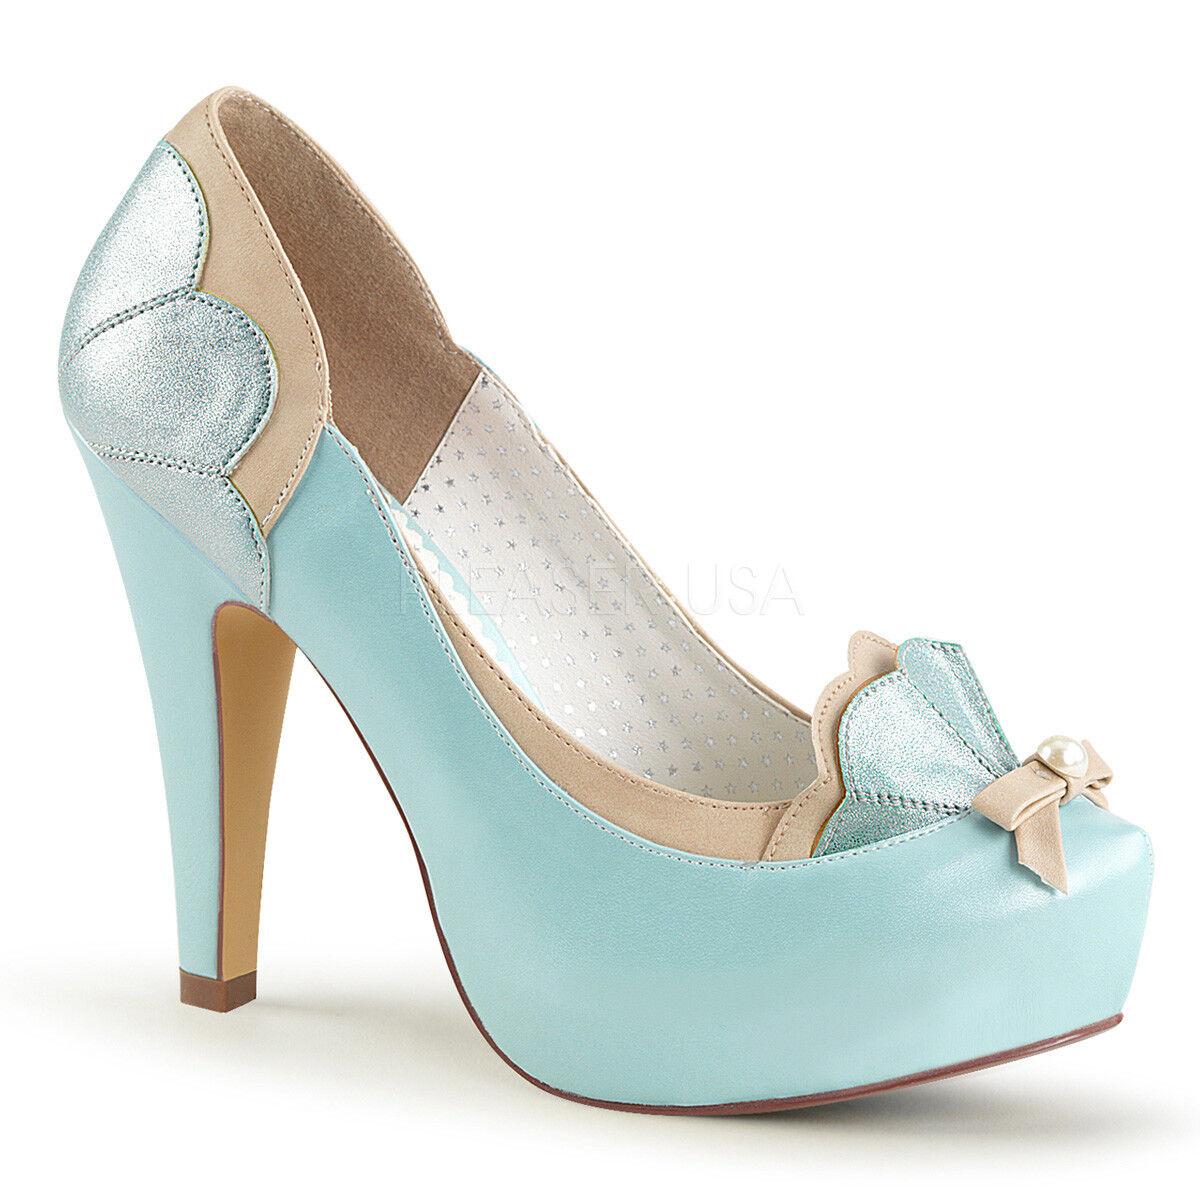 Pleaser Bettie 20 2 Pin Up 4 1 2 20  Heel Platform Court zapatos Sandalias Retro años 50 d142fe